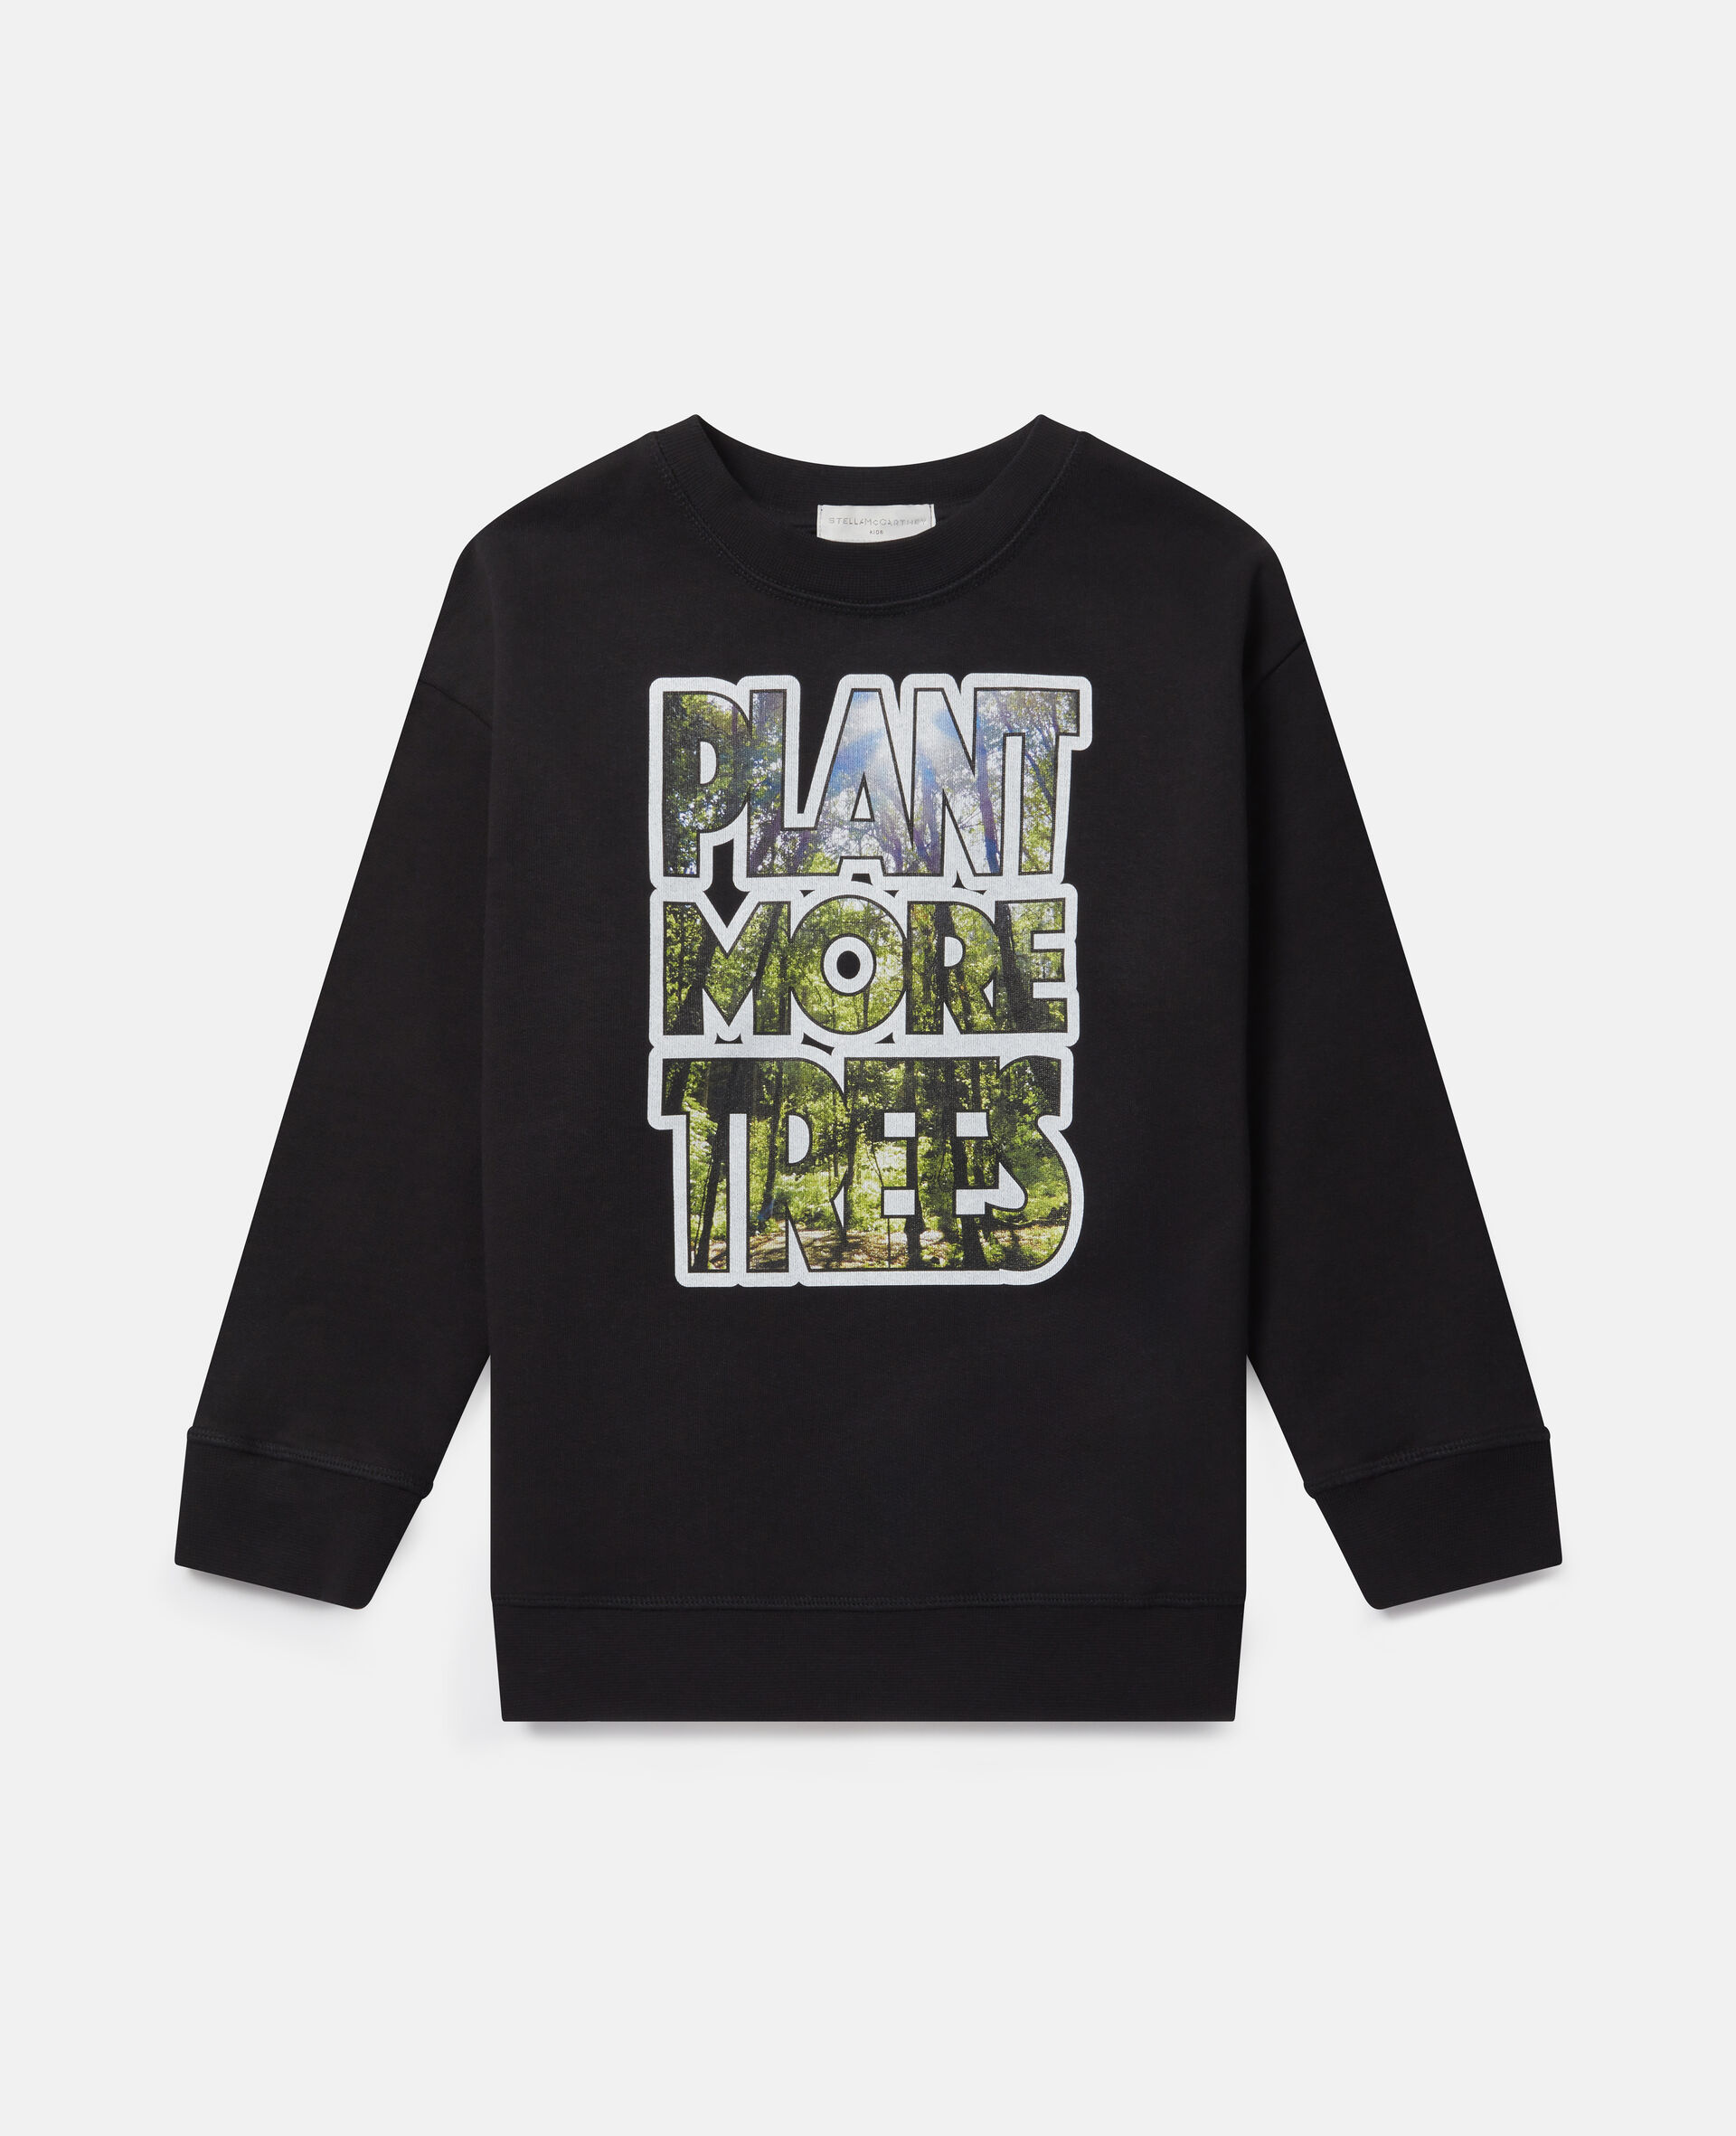 Oversized 'Plant More Trees' Fleece Sweatshirt-Black-large image number 0